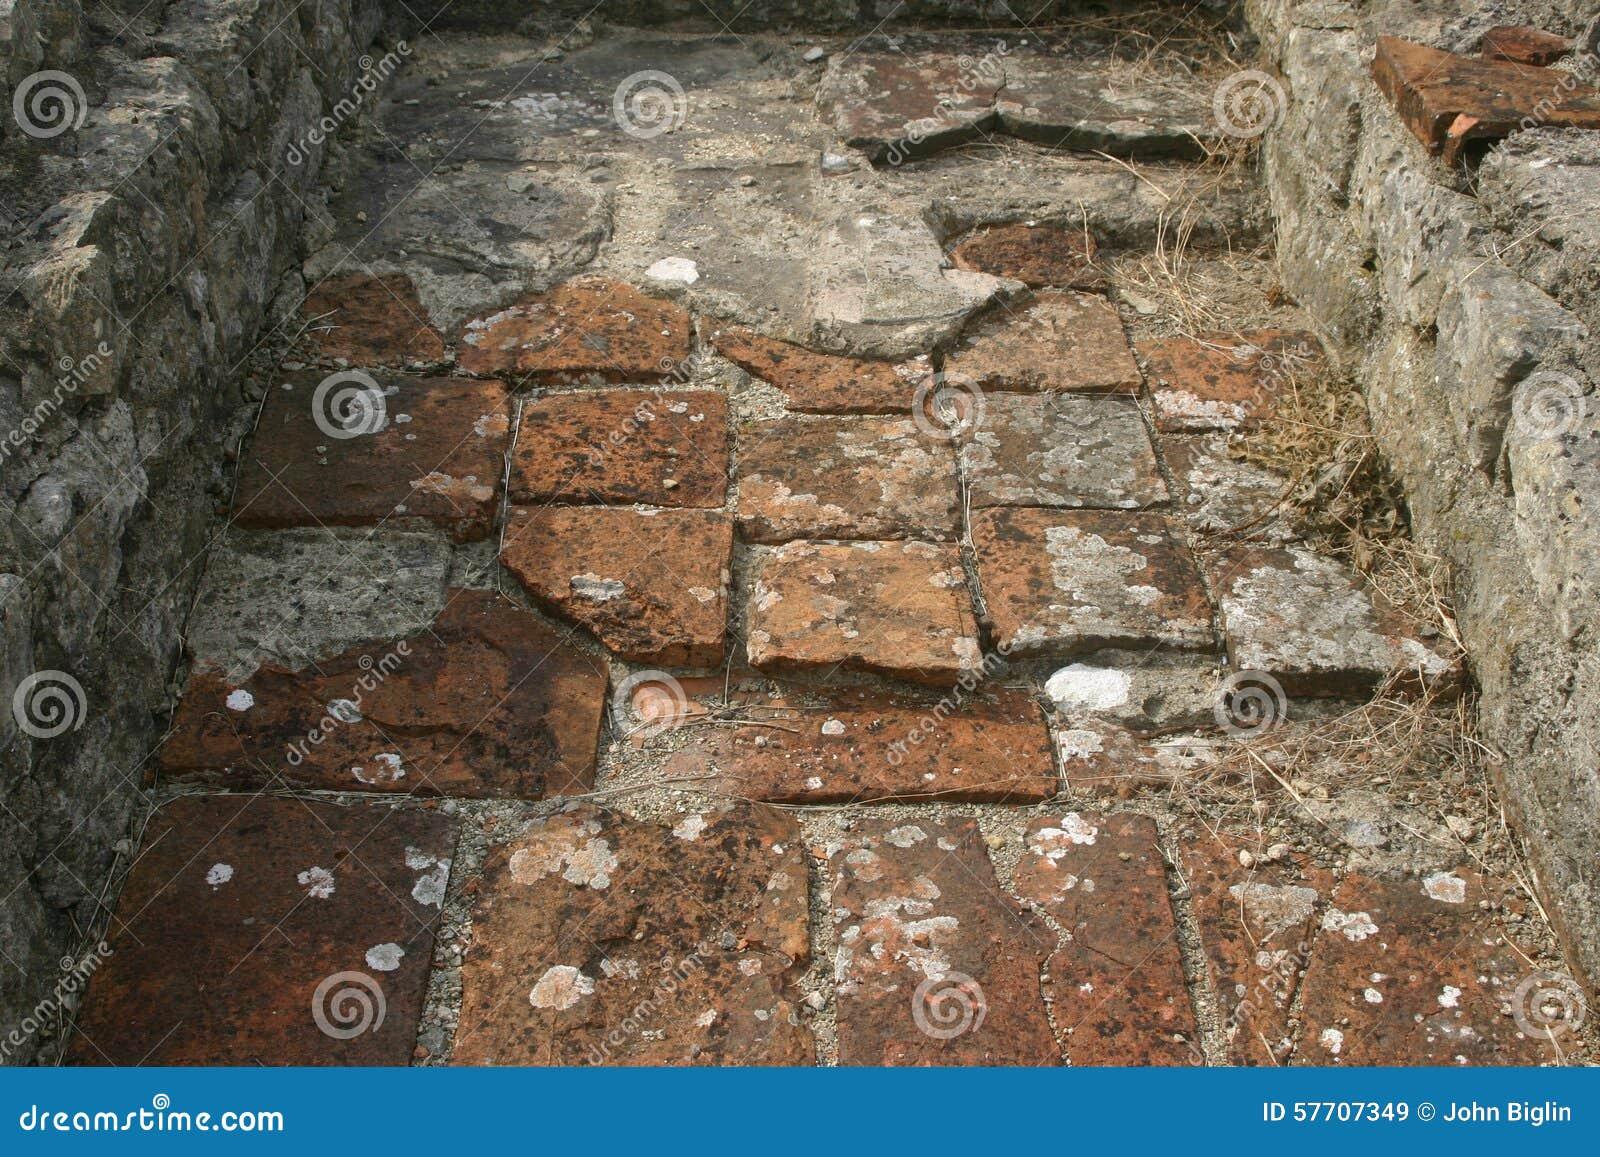 Roman Villa Floor Tiles Stock Image Image Of Ancient 57707349